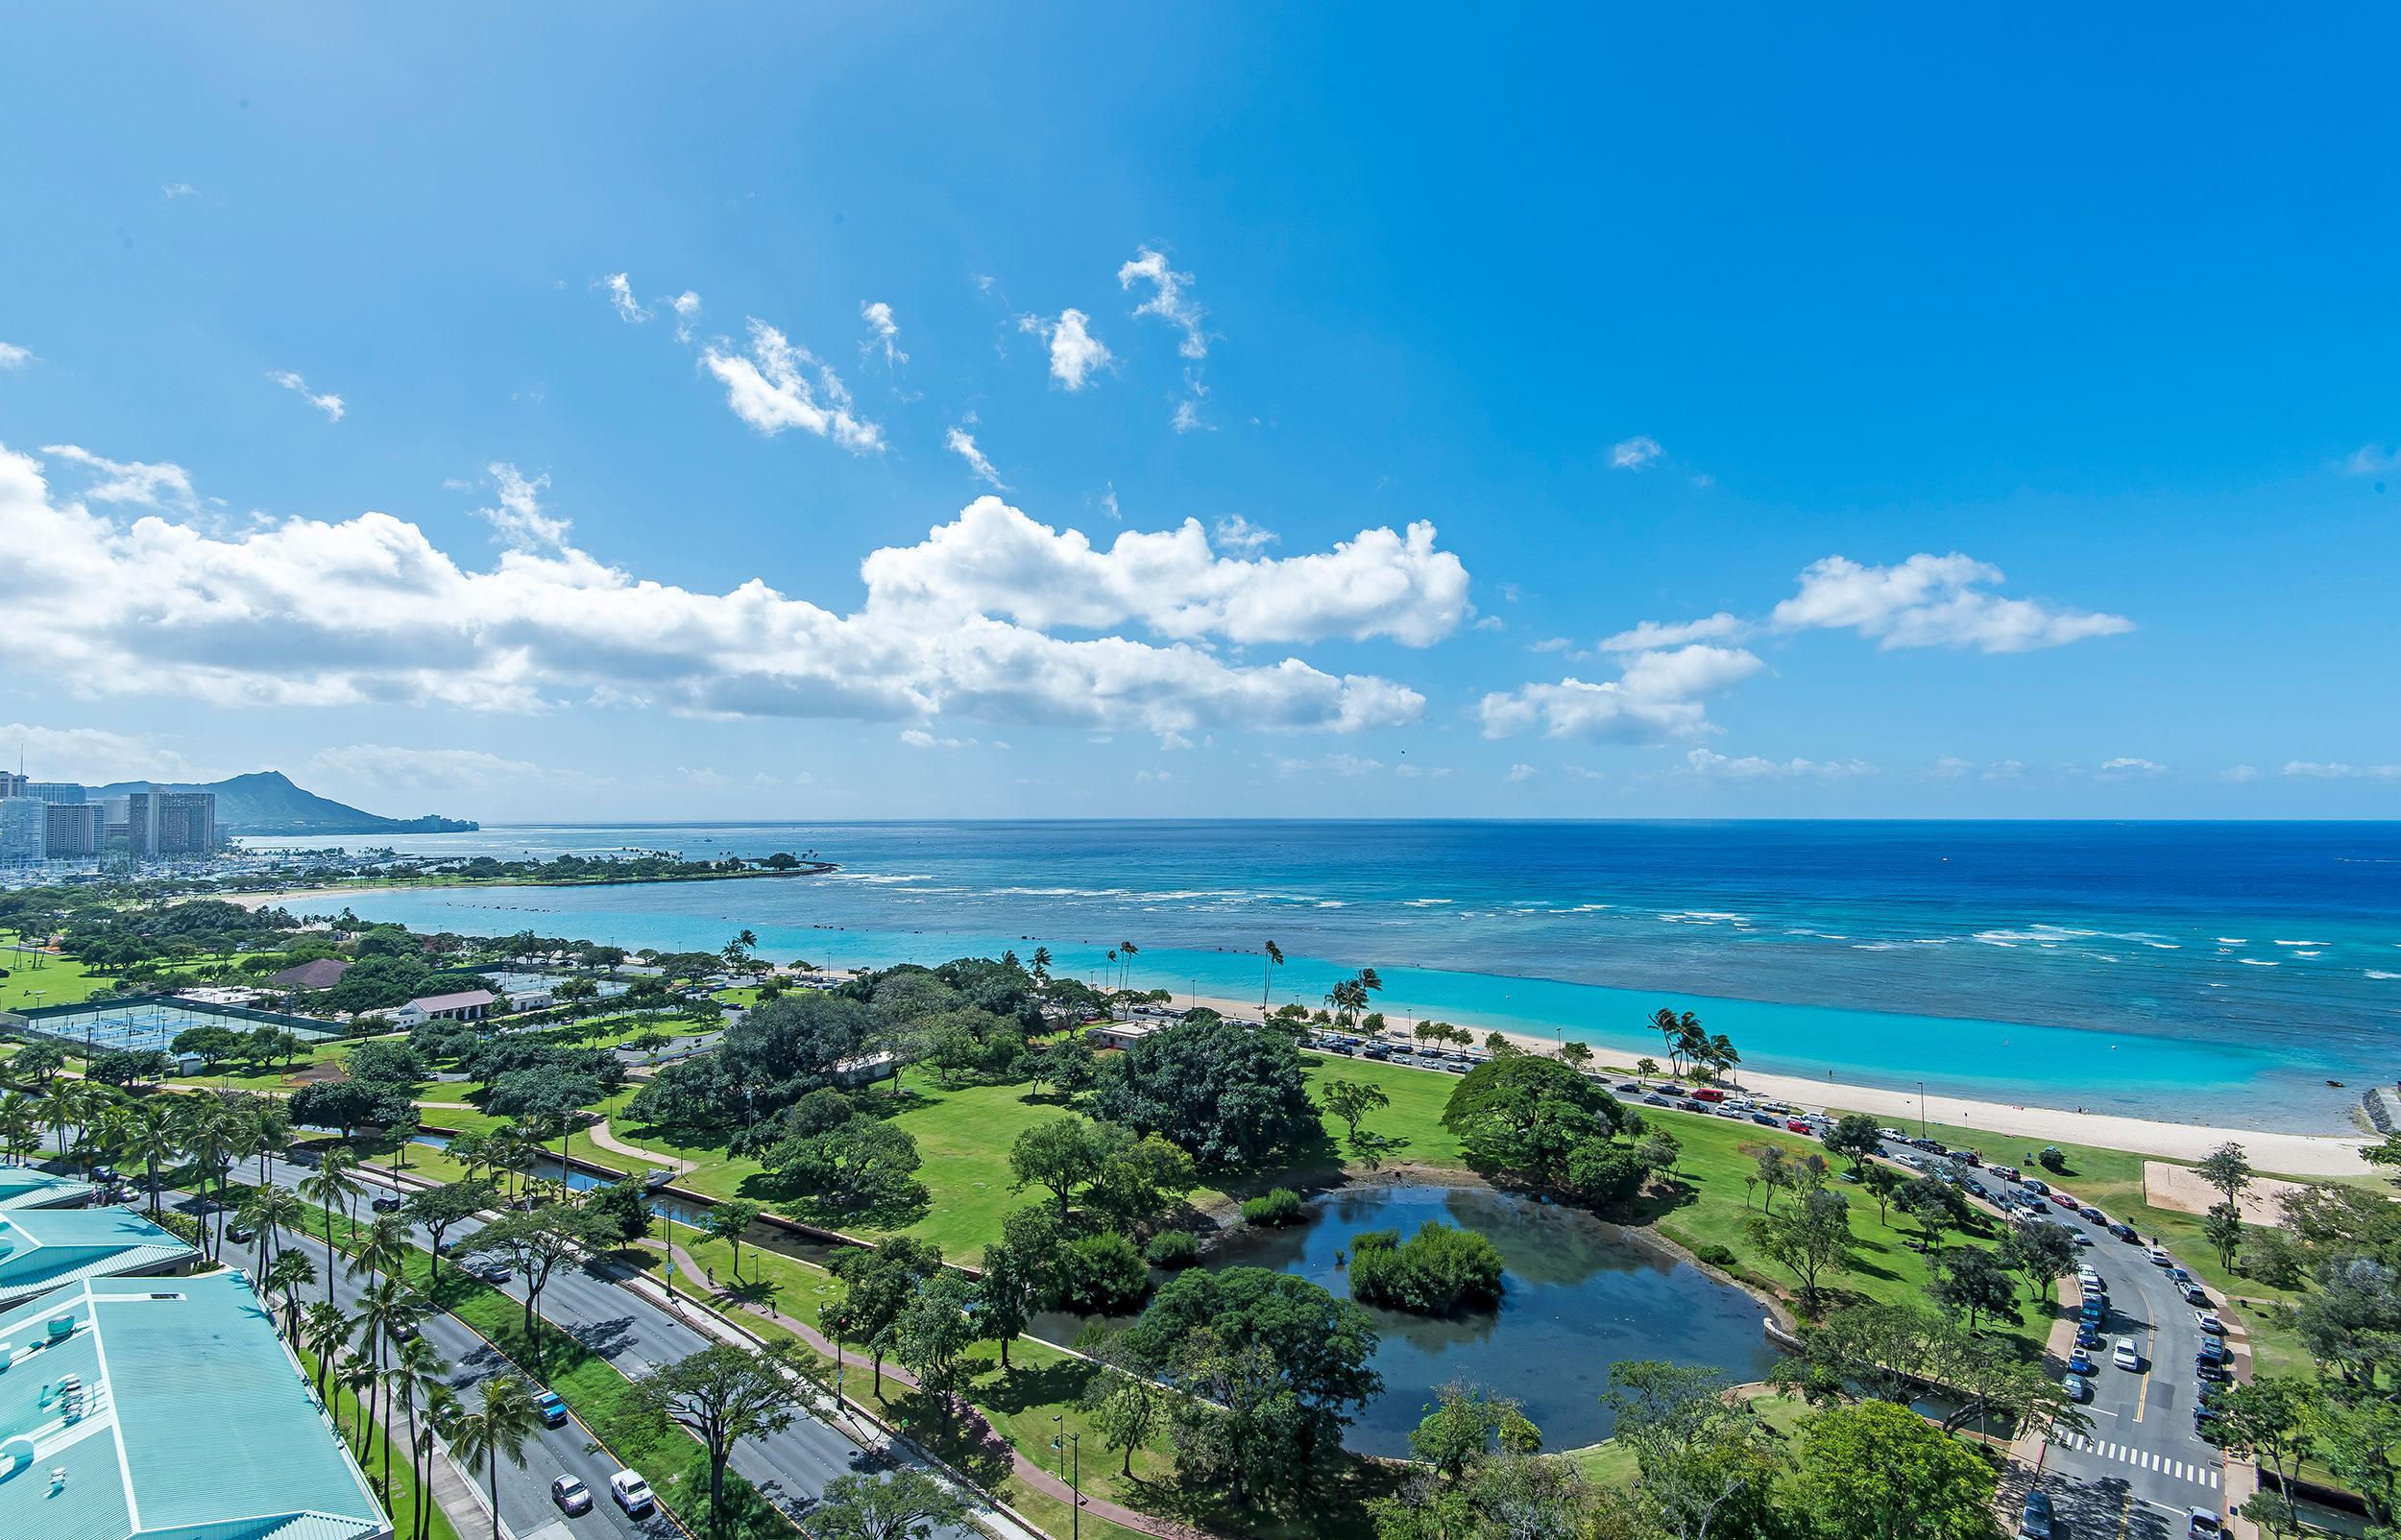 Condominium 为 销售 在 1118 Ala Moana Boulevard #1700, Honolulu, HI, 96814 火奴鲁鲁, 夏威夷,96814 美国